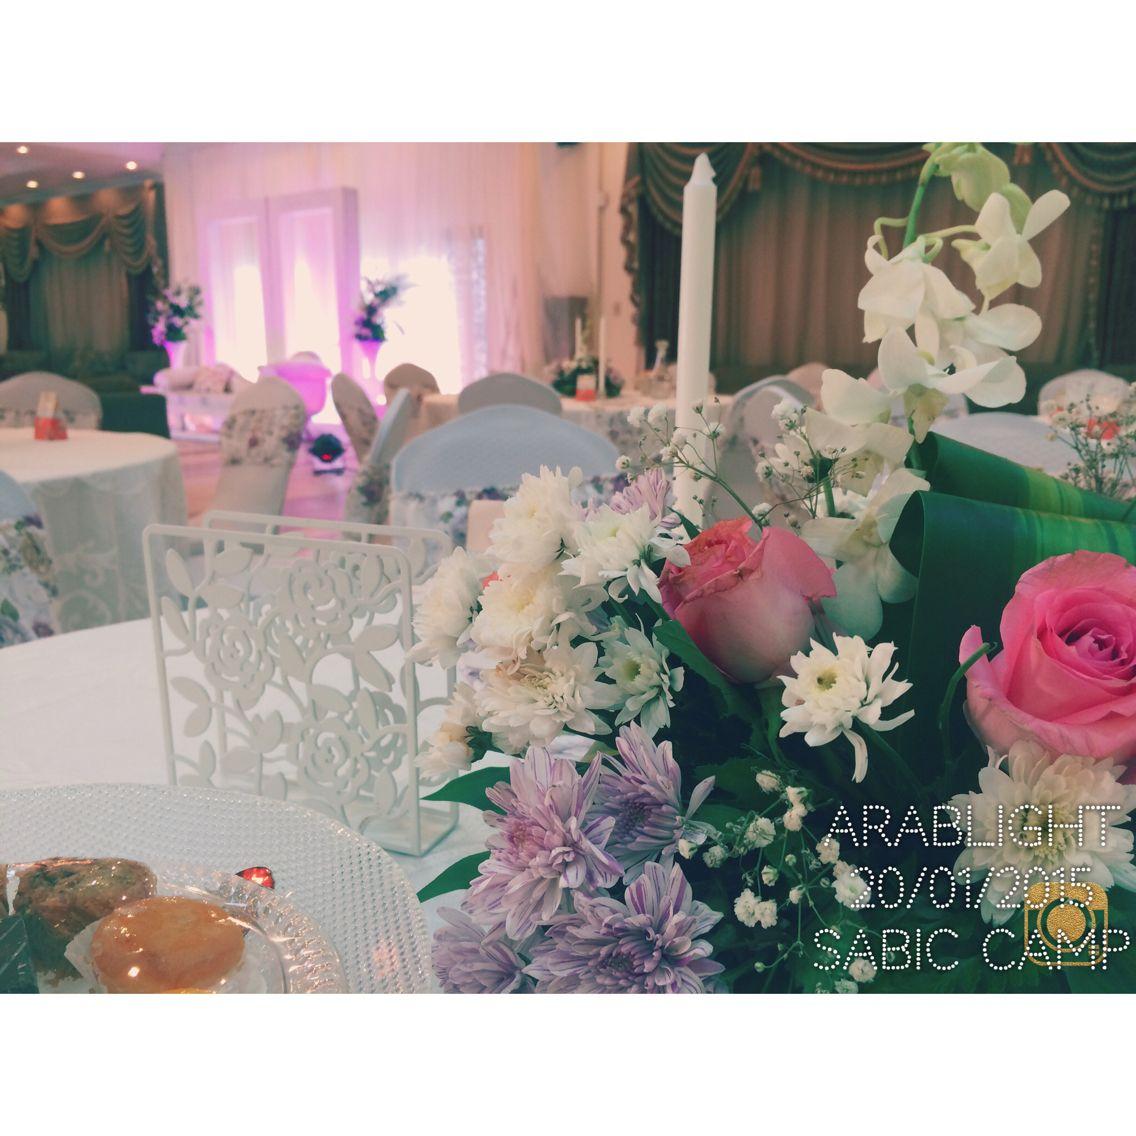 Event Party Wedding ابداع اراب لايت حفلات طاولات مناسبات مؤتمرات معارض كوشات مون لايت ليزر كوش 2015 تنسيق و Table Decorations Home Decor Decor